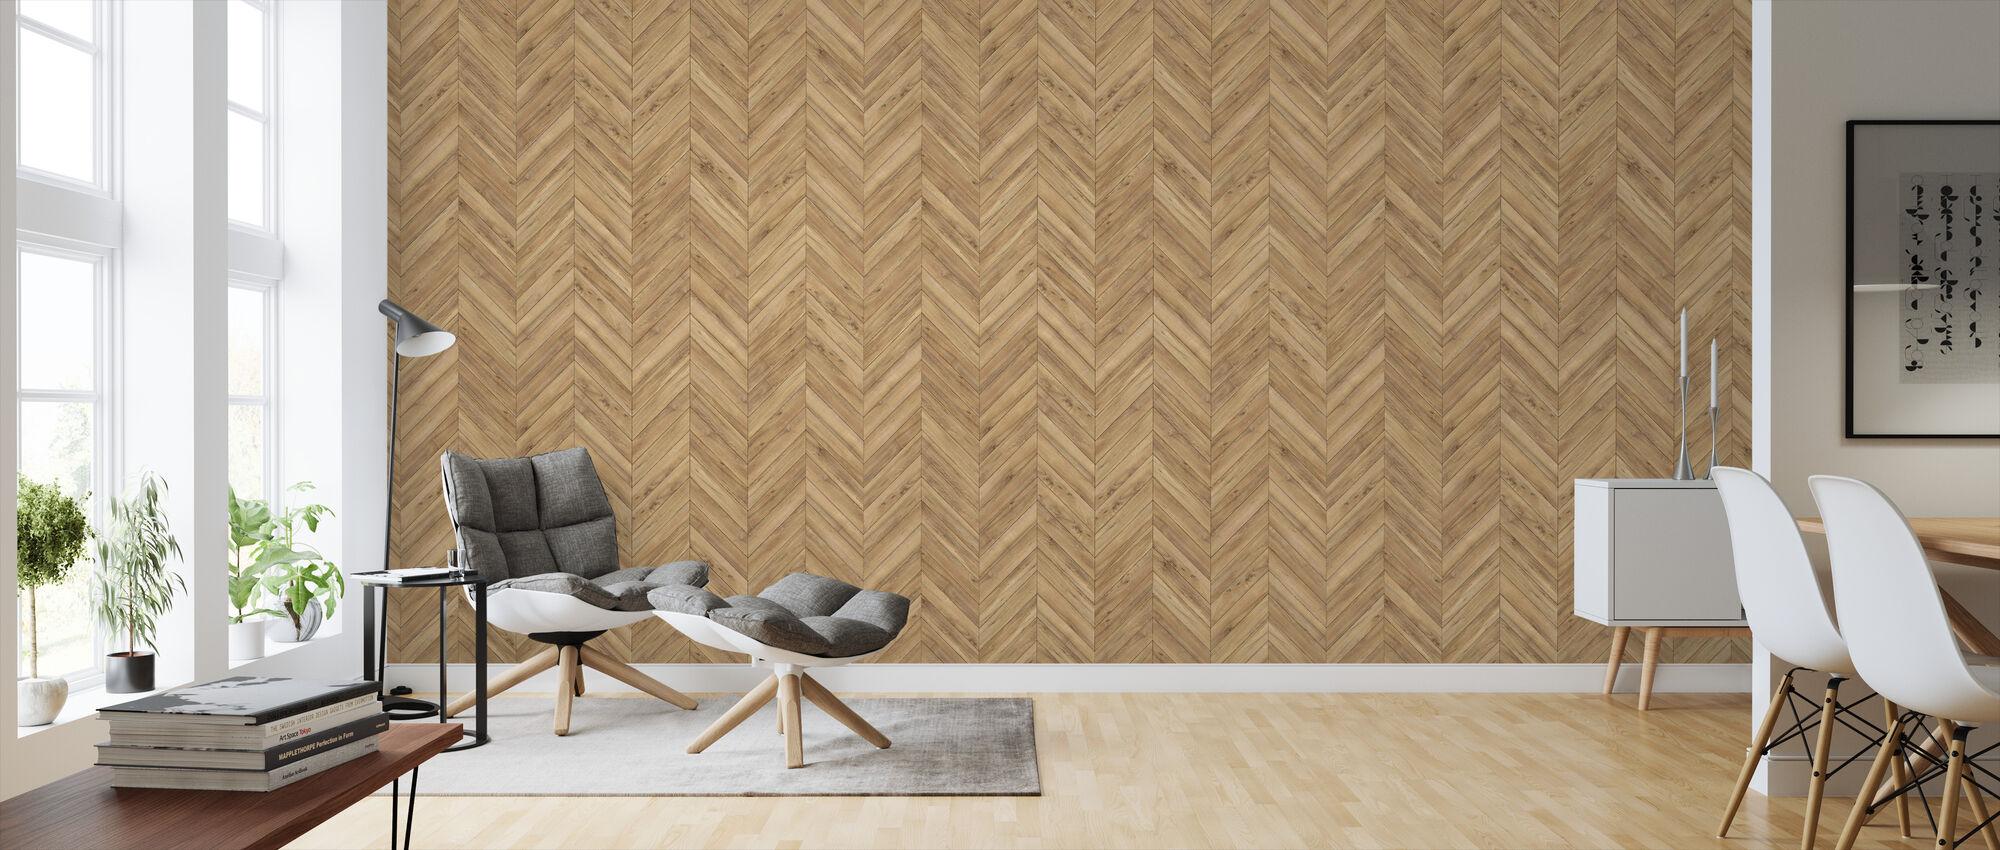 Chevron Parquet - Wallpaper - Living Room